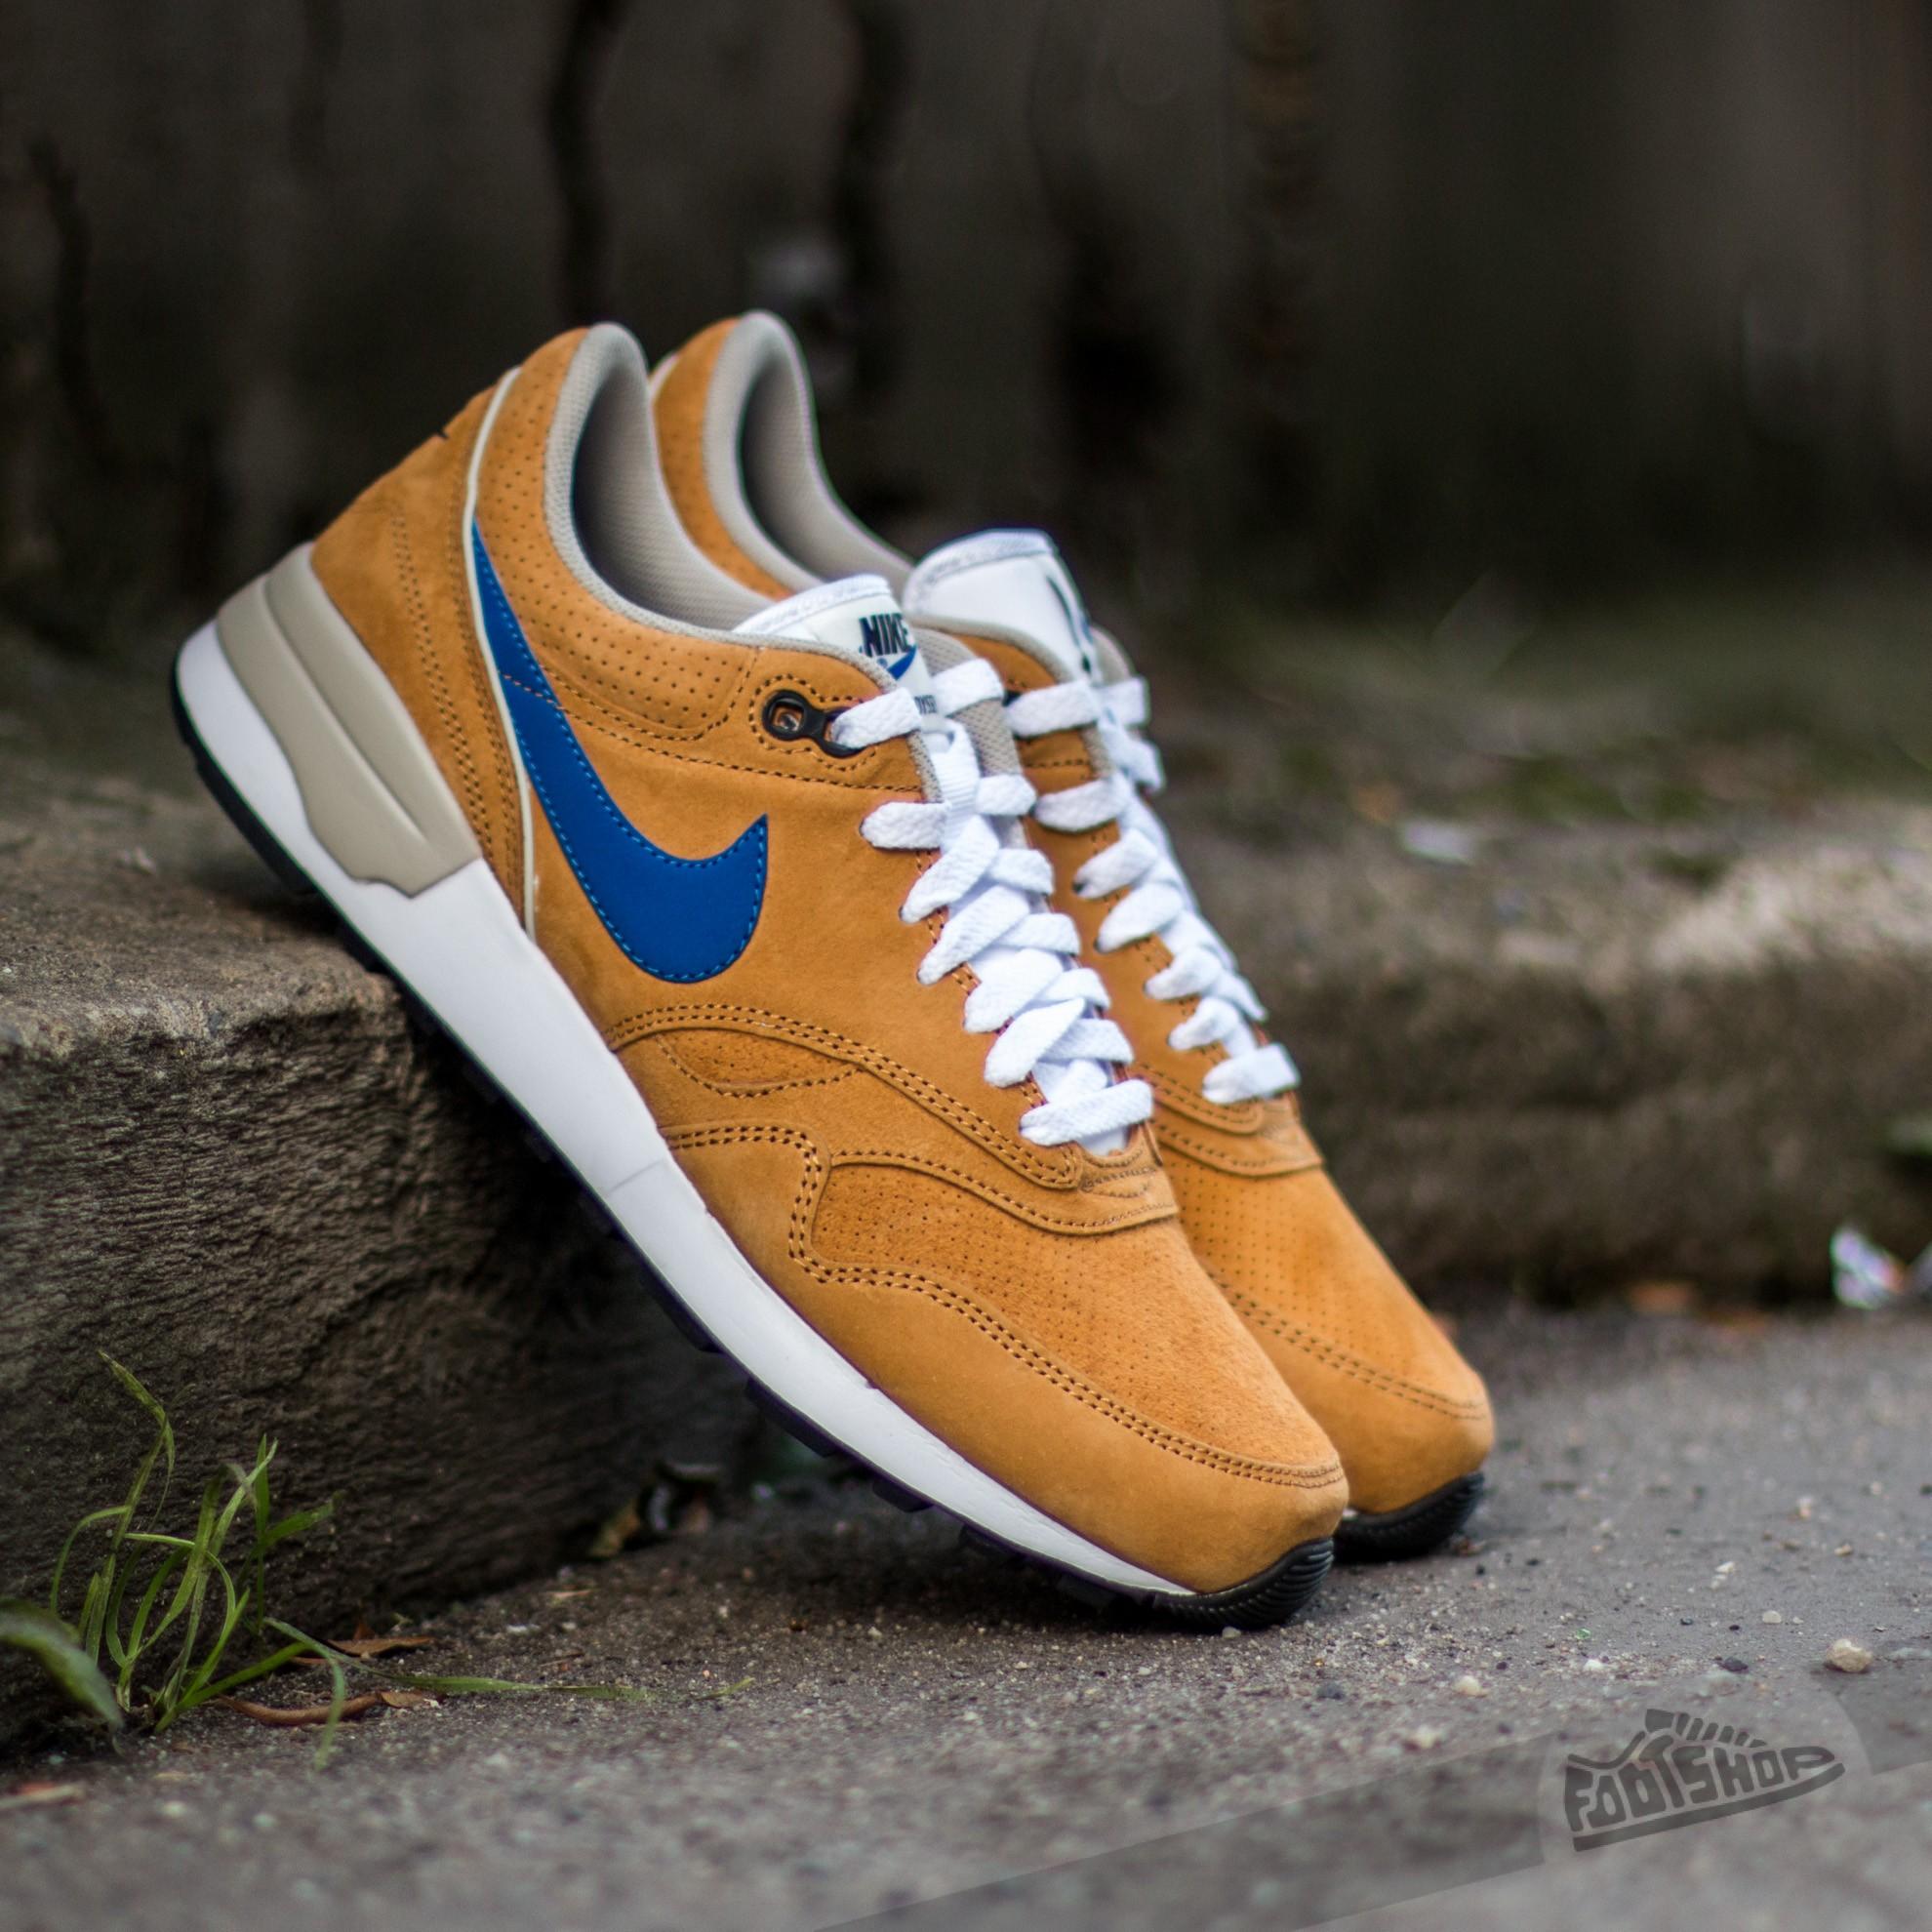 Hombre rico Destructivo O cualquiera  Men's shoes Nike Air Odyssey LTR Bronze/ Varsity Royal-BG Chalk | Footshop